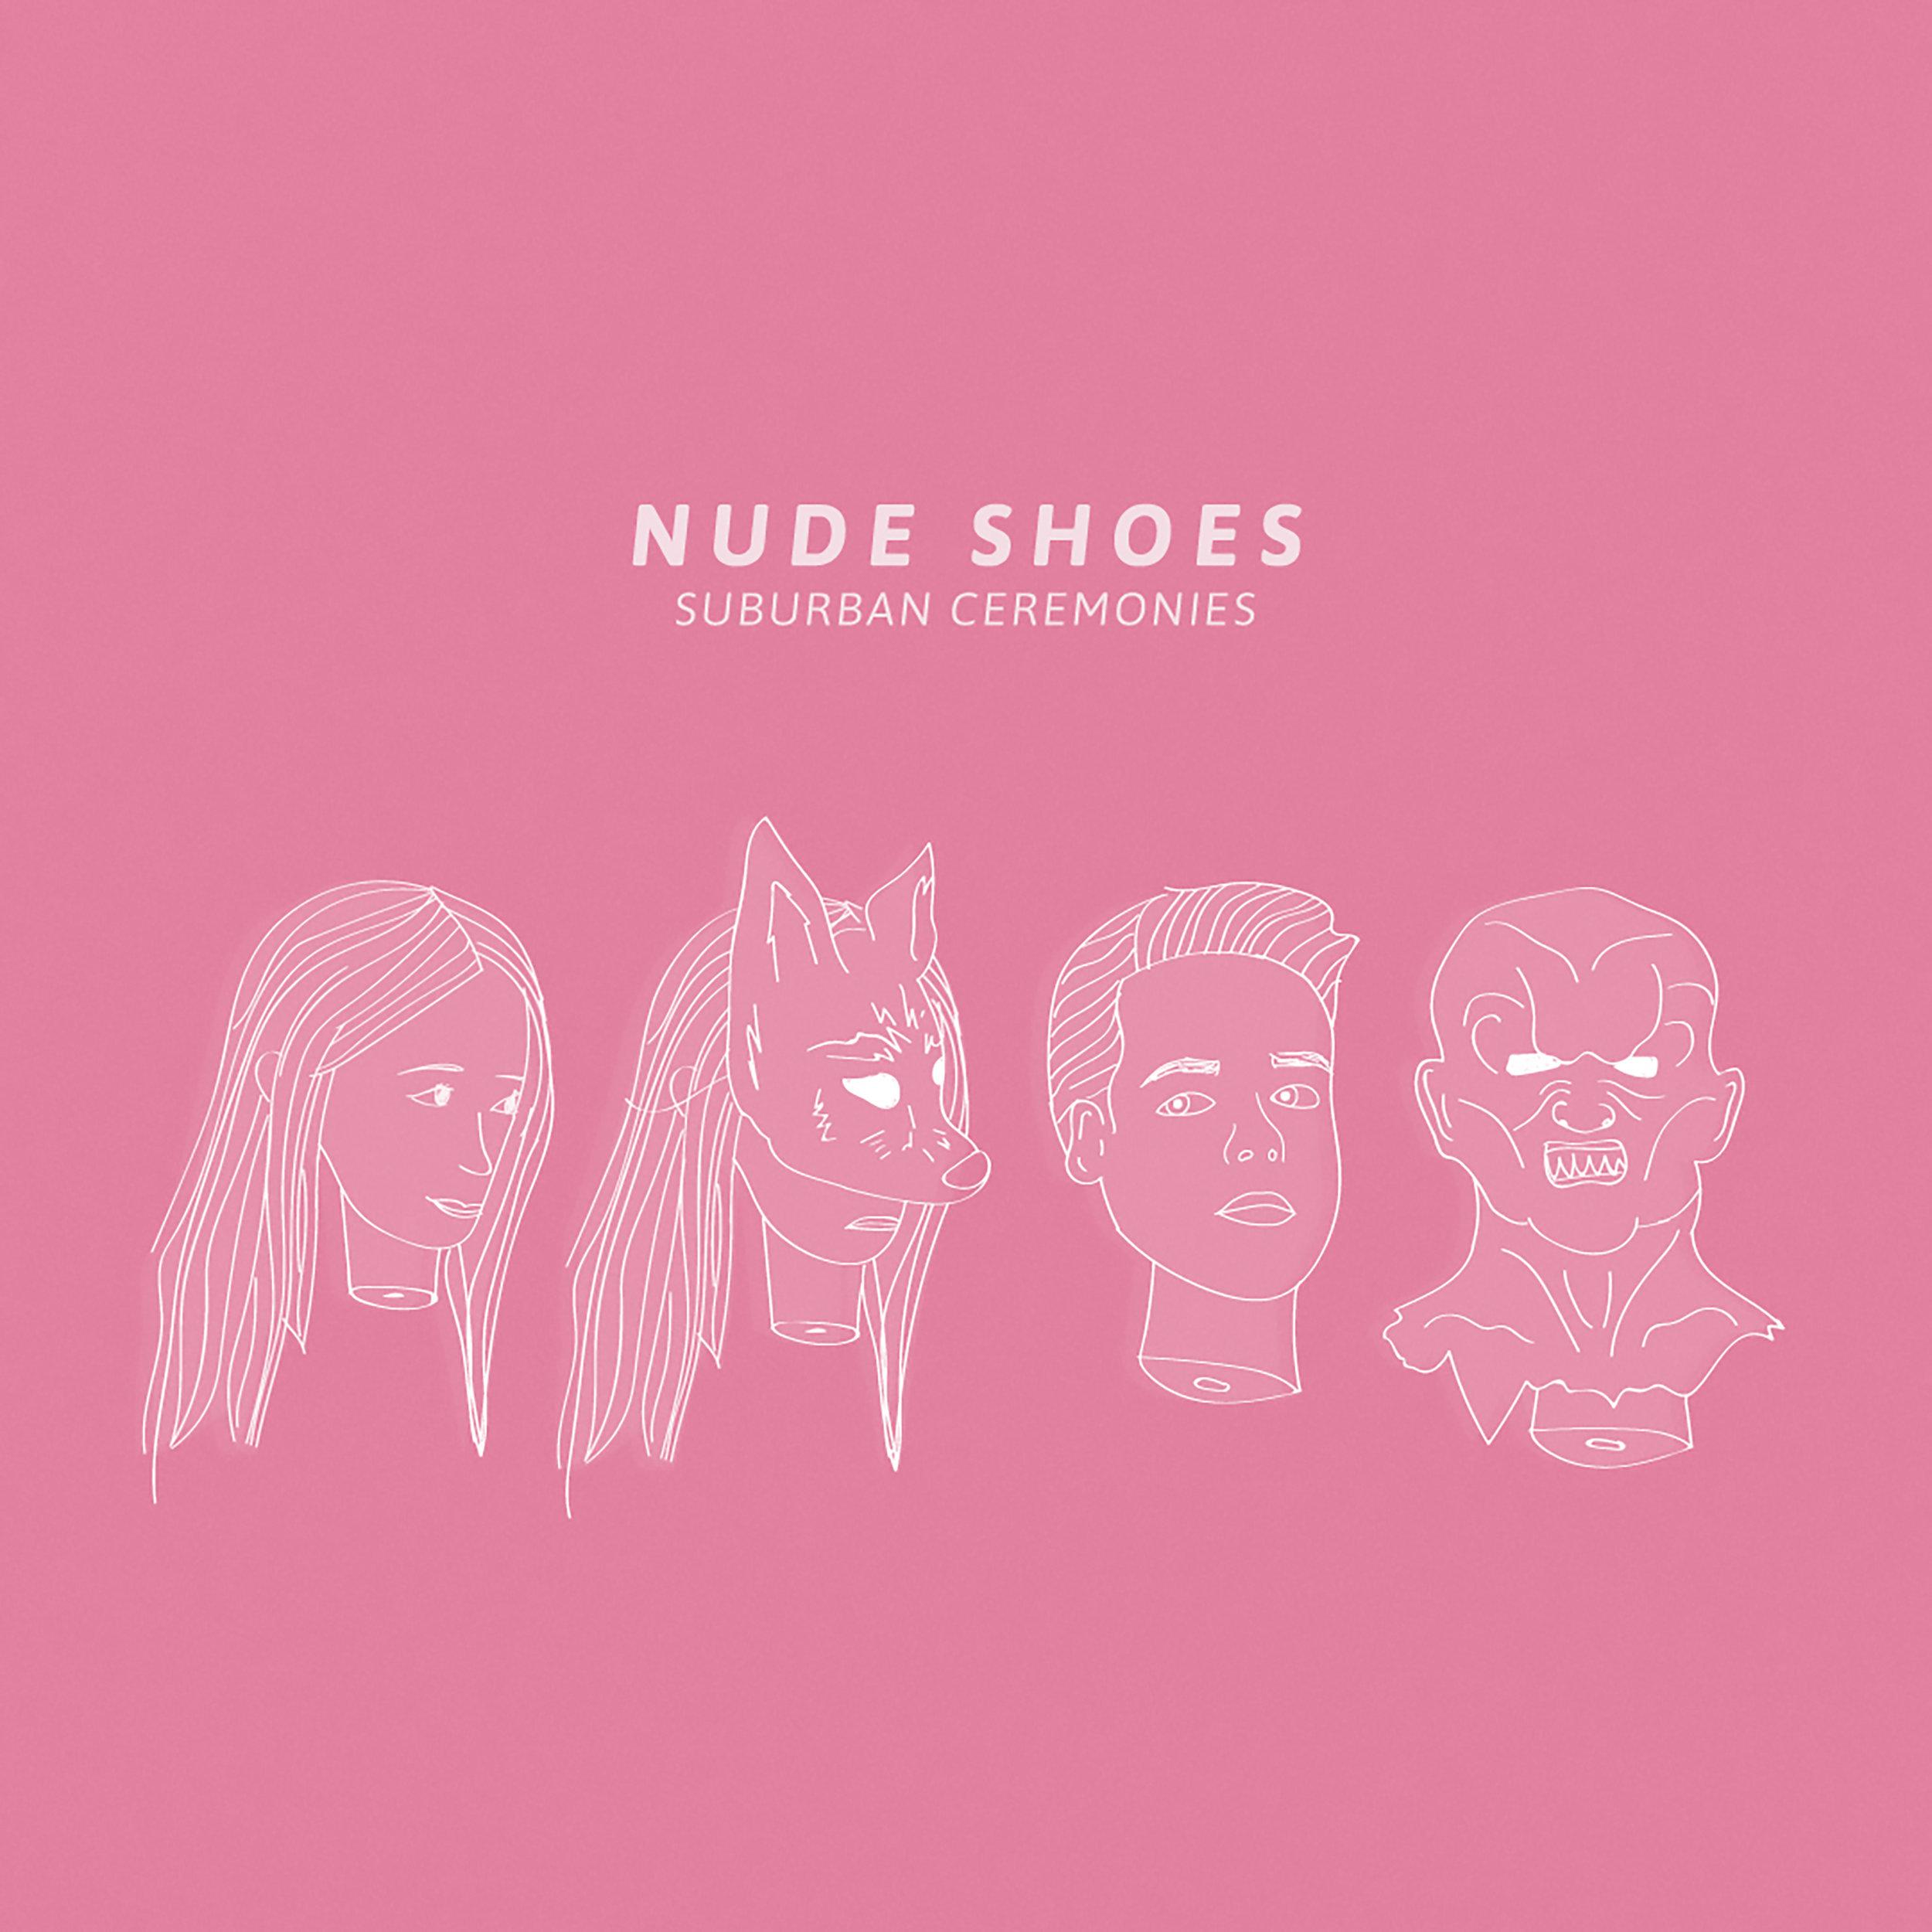 NudeShoes_Suburban Ceremonies.jpeg